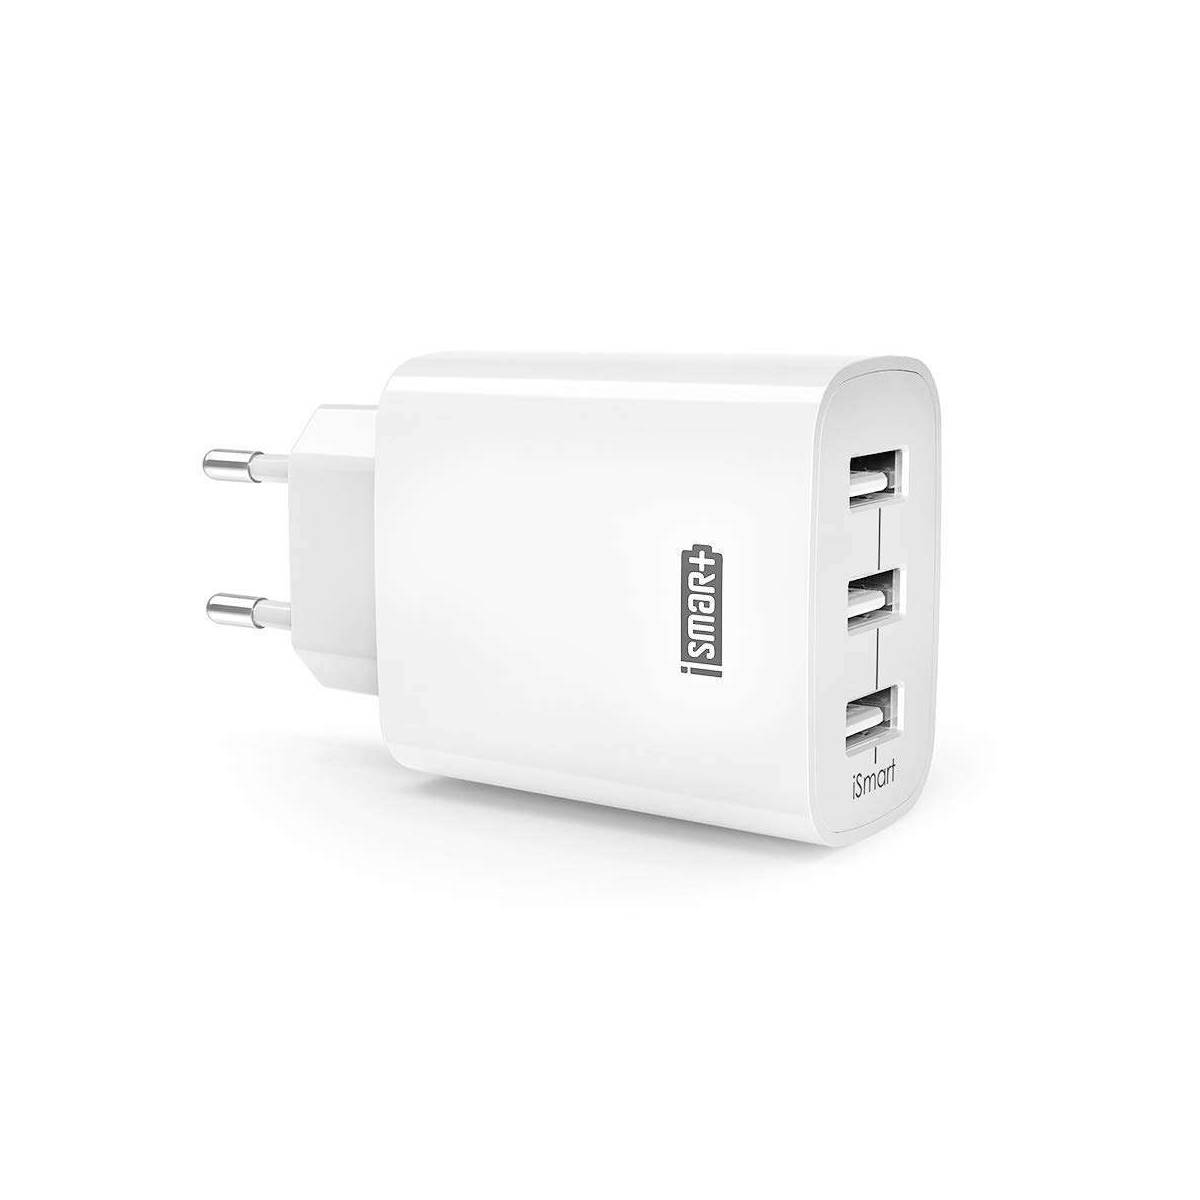 RAVPower 30W QC 3.0 dobbelt USB oplader i Hvid Mackablar